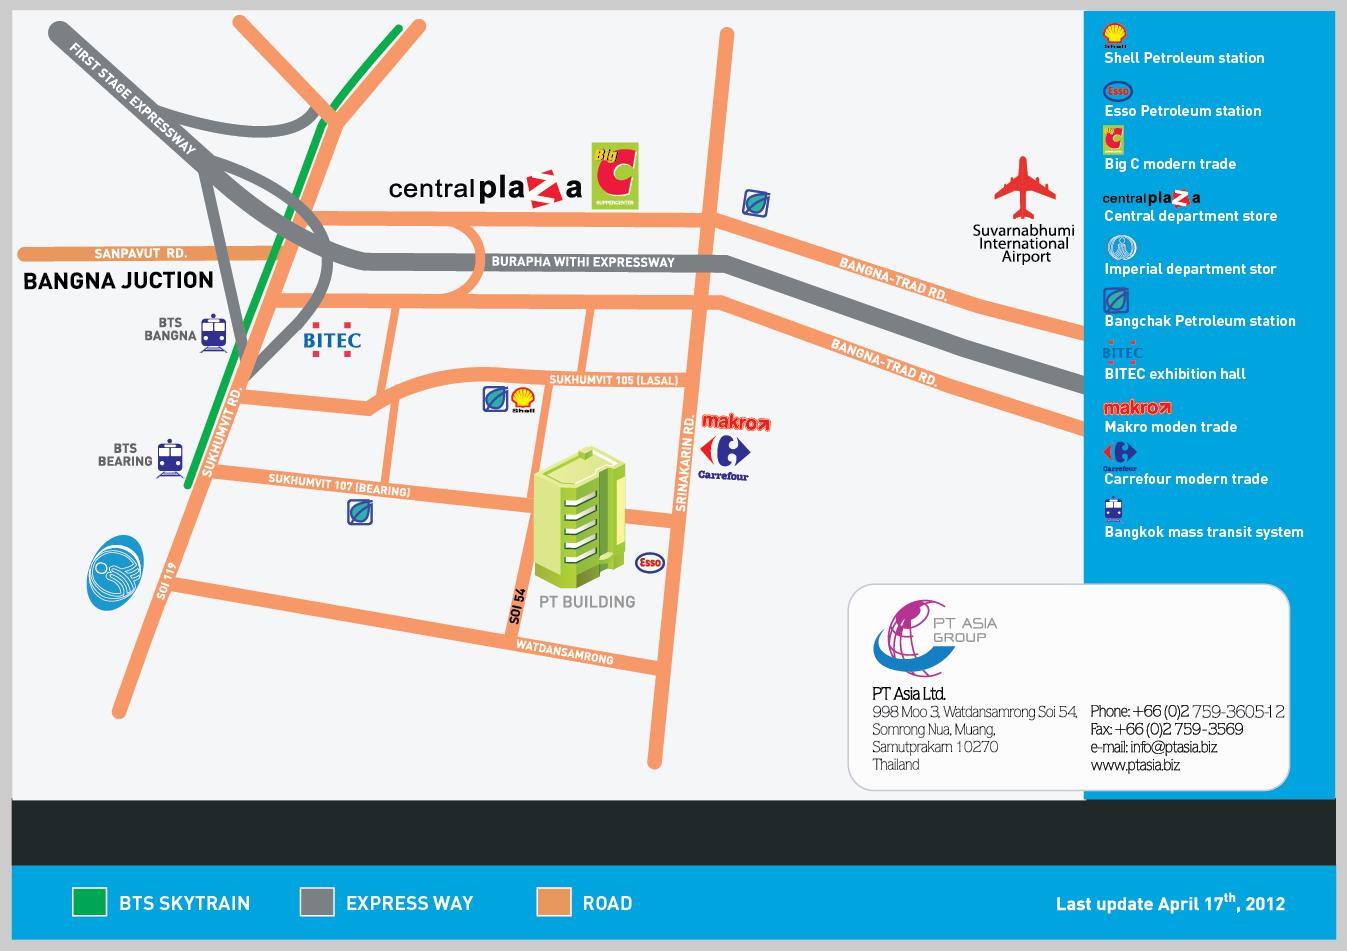 PT Asia map / last update April 17th, 2012